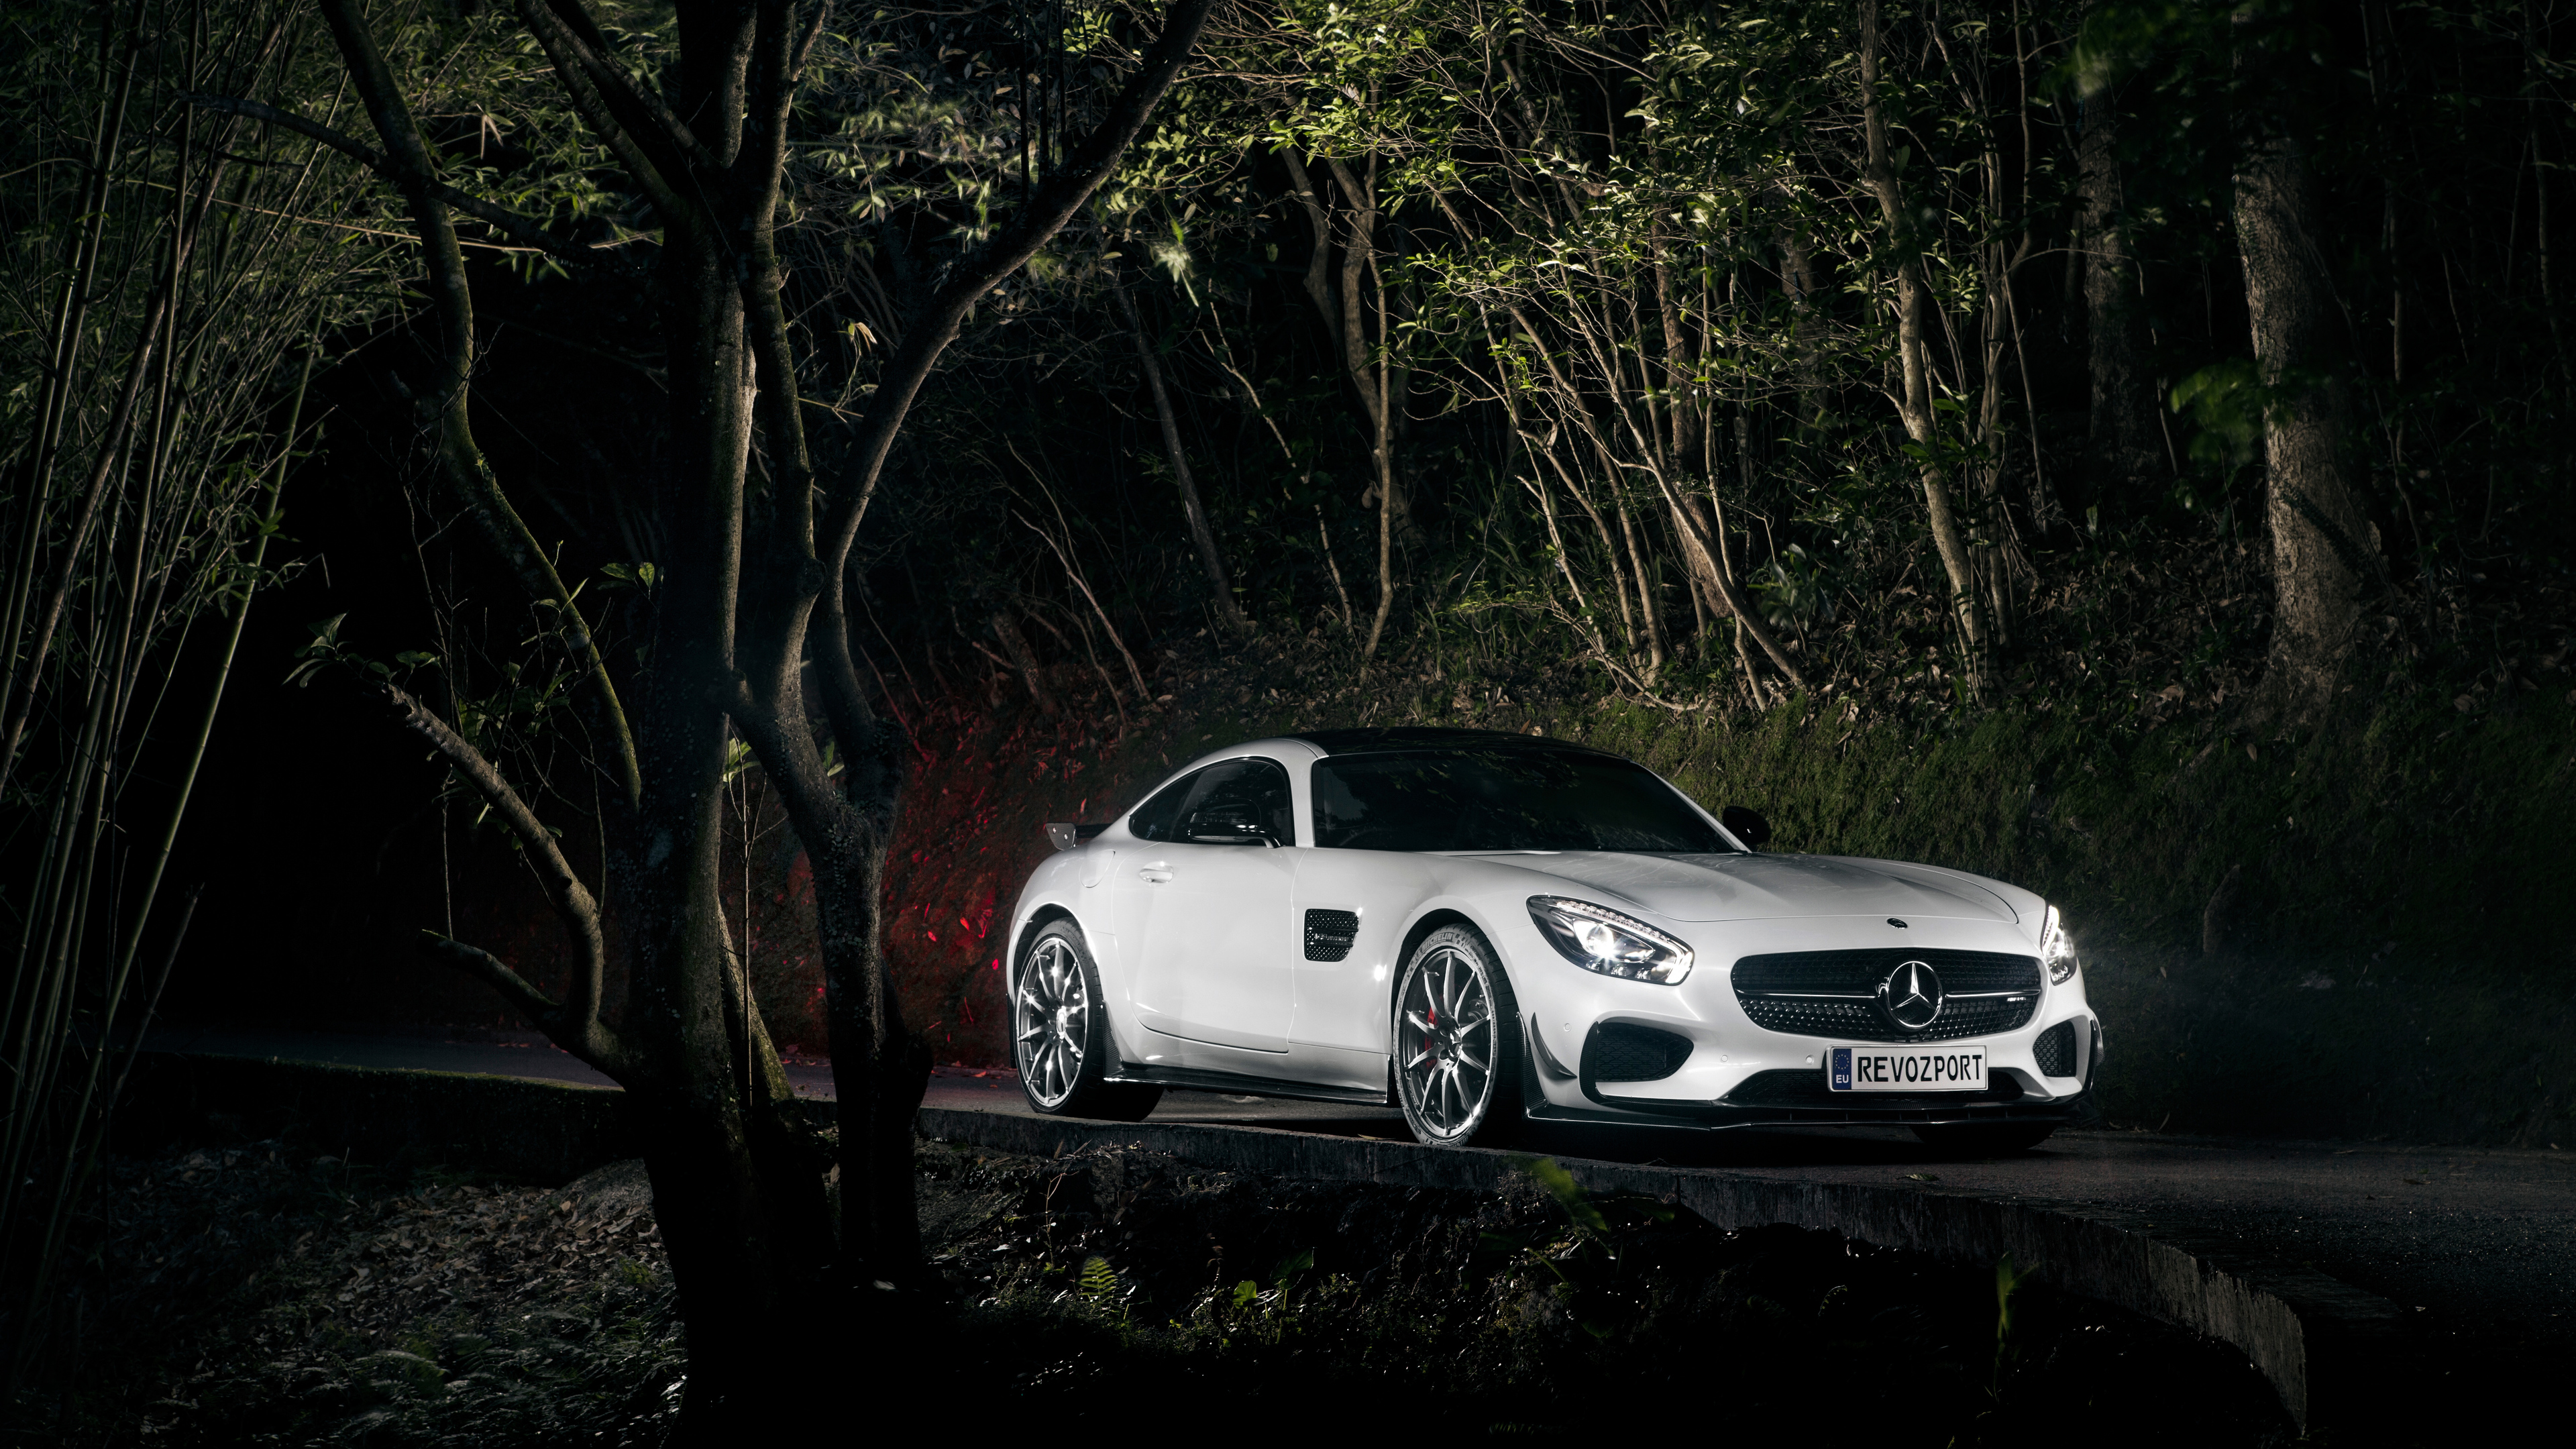 white mercedes benz 1559764645 - White Mercedes Benz - mercedes benz wallpapers, hd-wallpapers, cars wallpapers, 4k-wallpapers